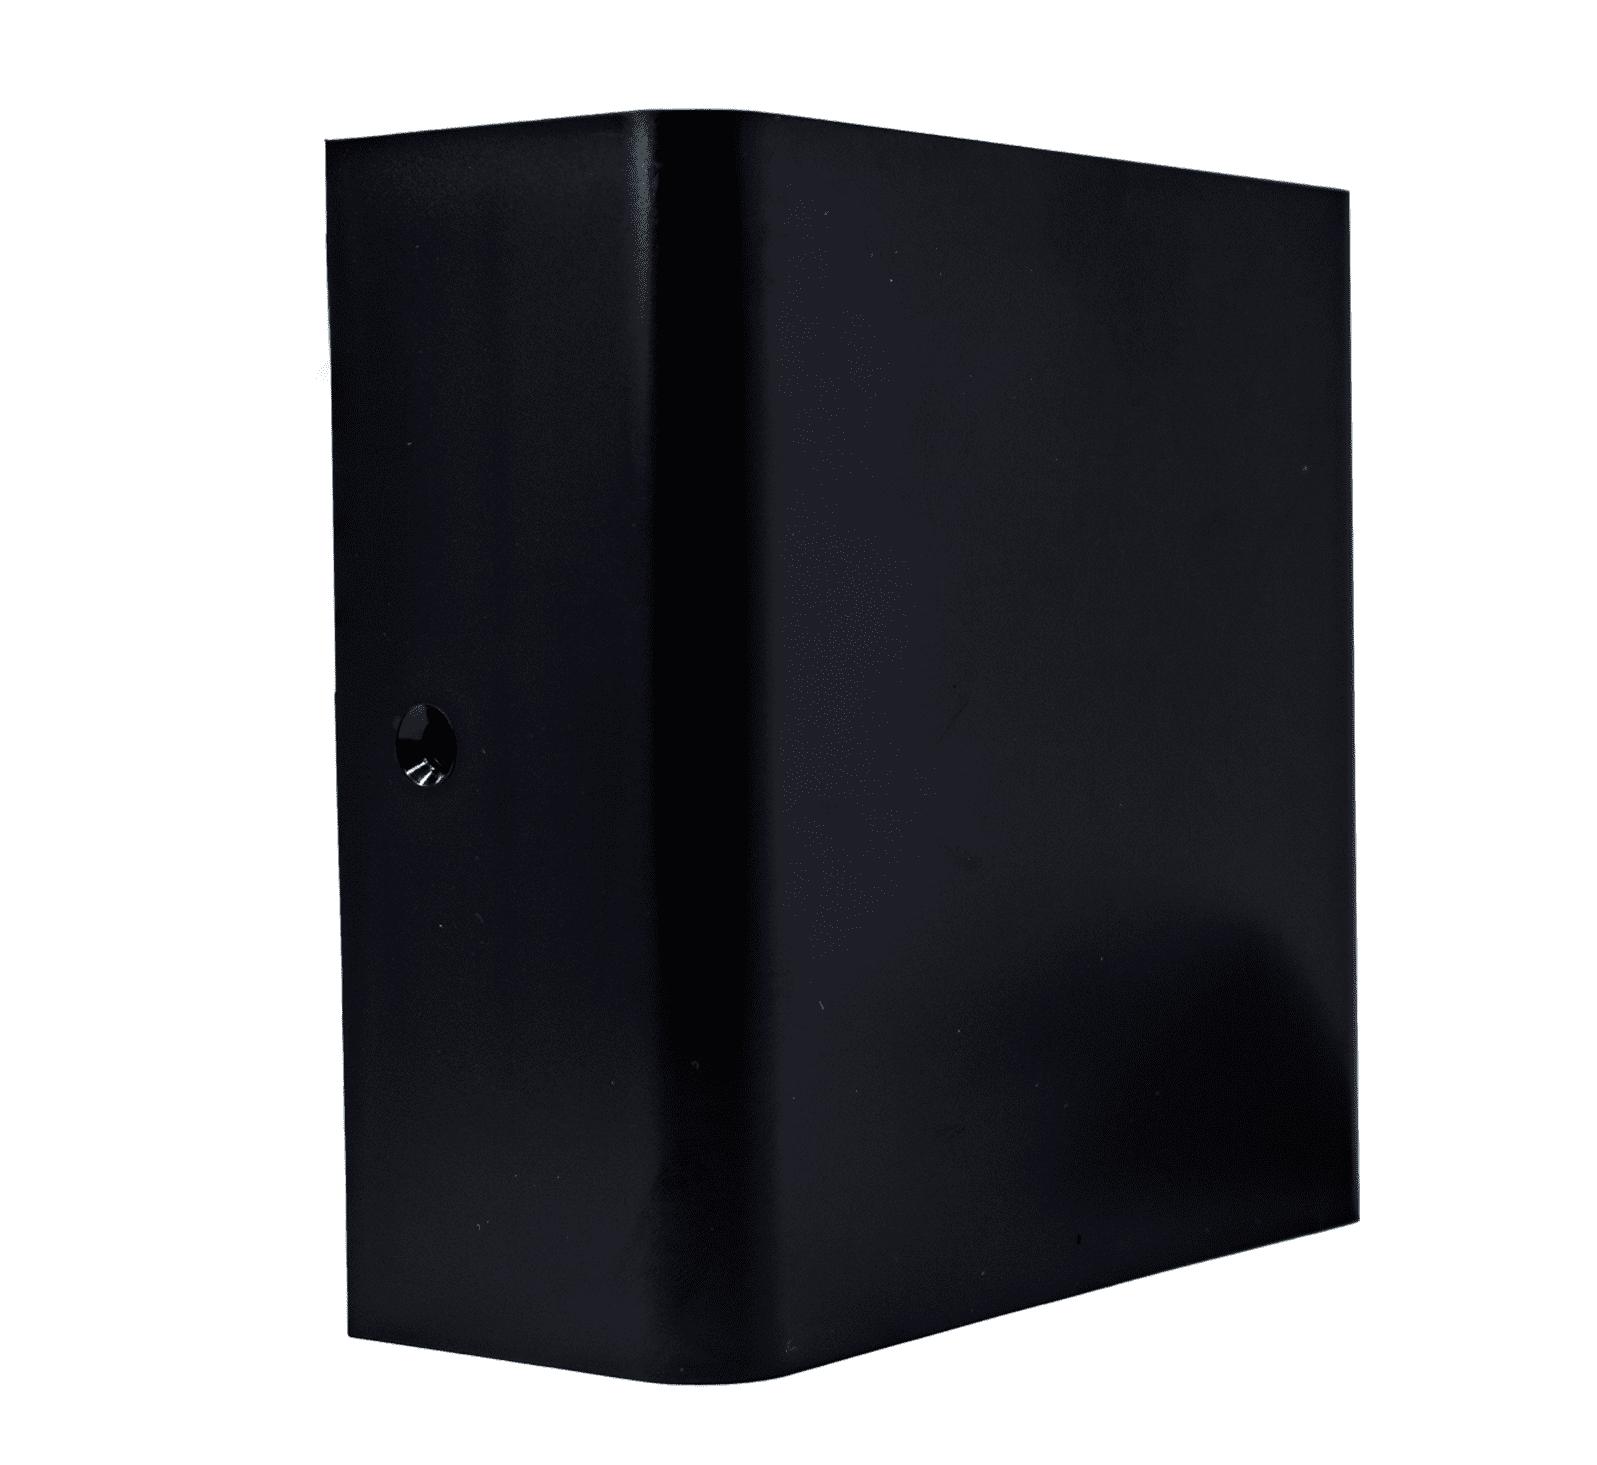 Luminária Arandela De Led Kian 12821 Ip65 3w 6500k Preta